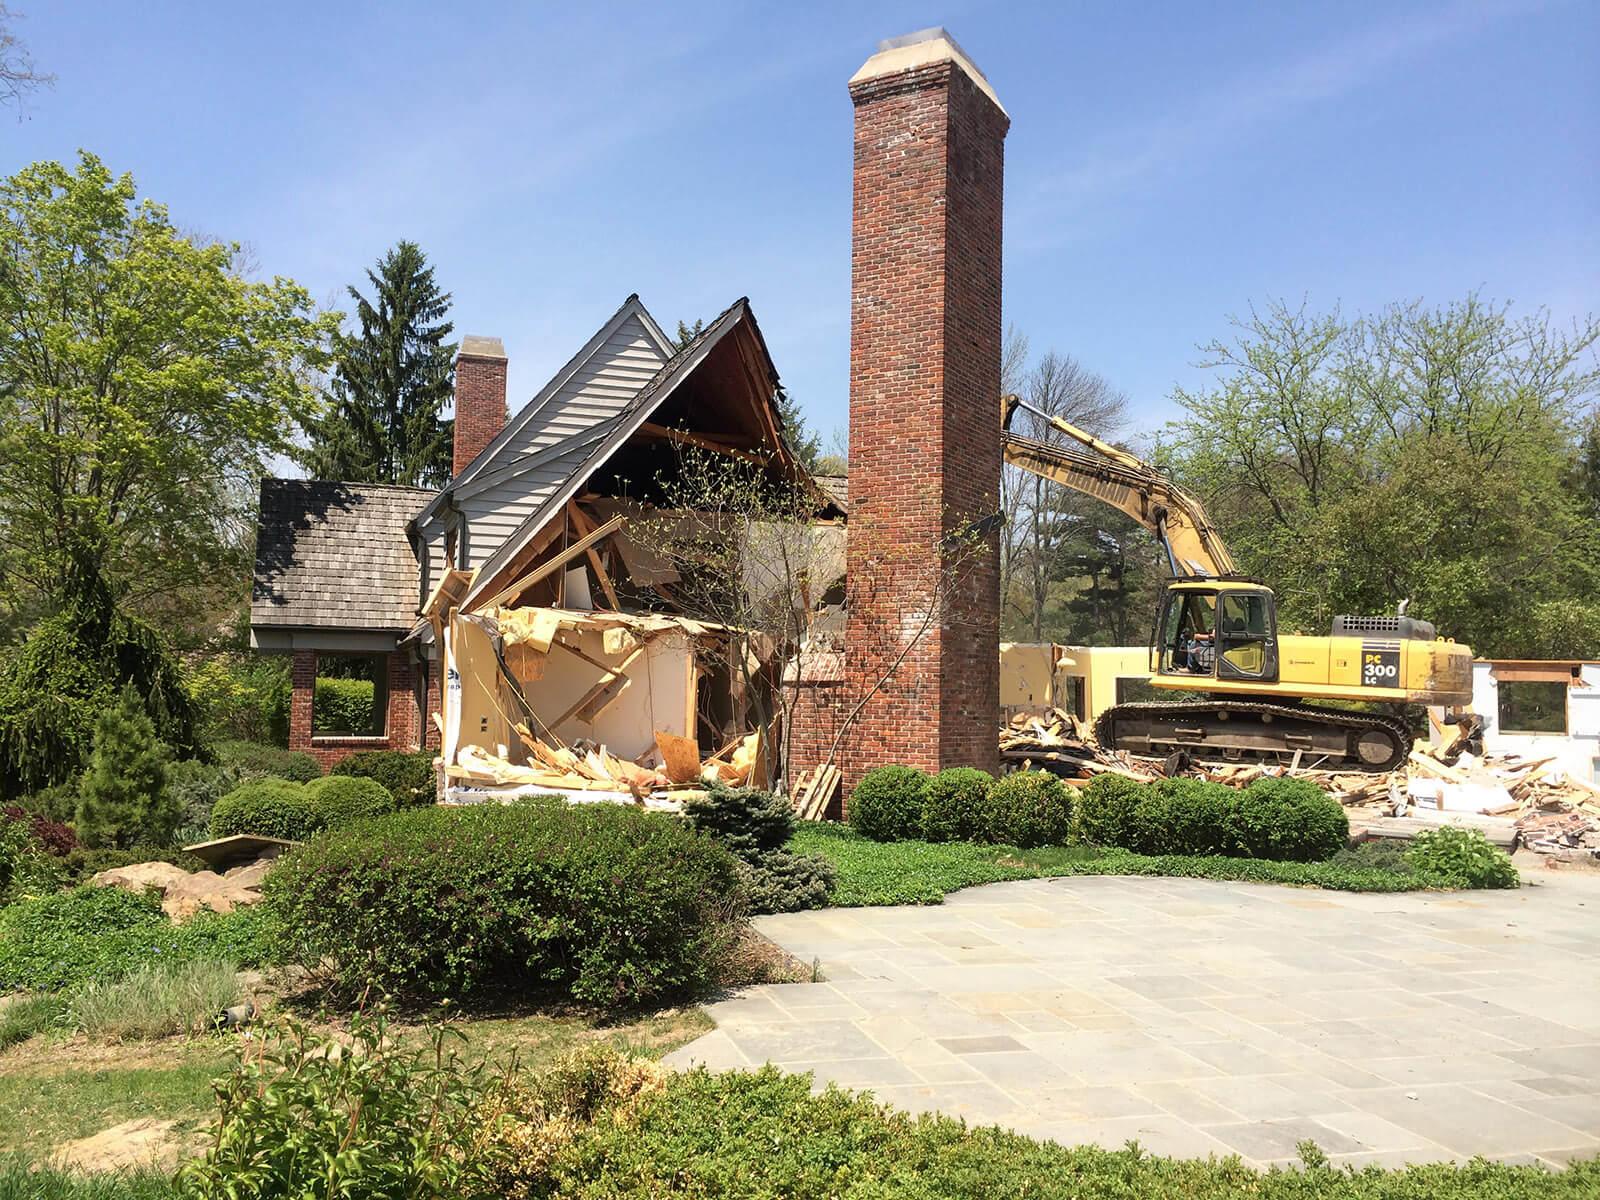 Ennis Custom Homes - Home Demolition - Home Builder in Carmel, IN - 116th st demo 2